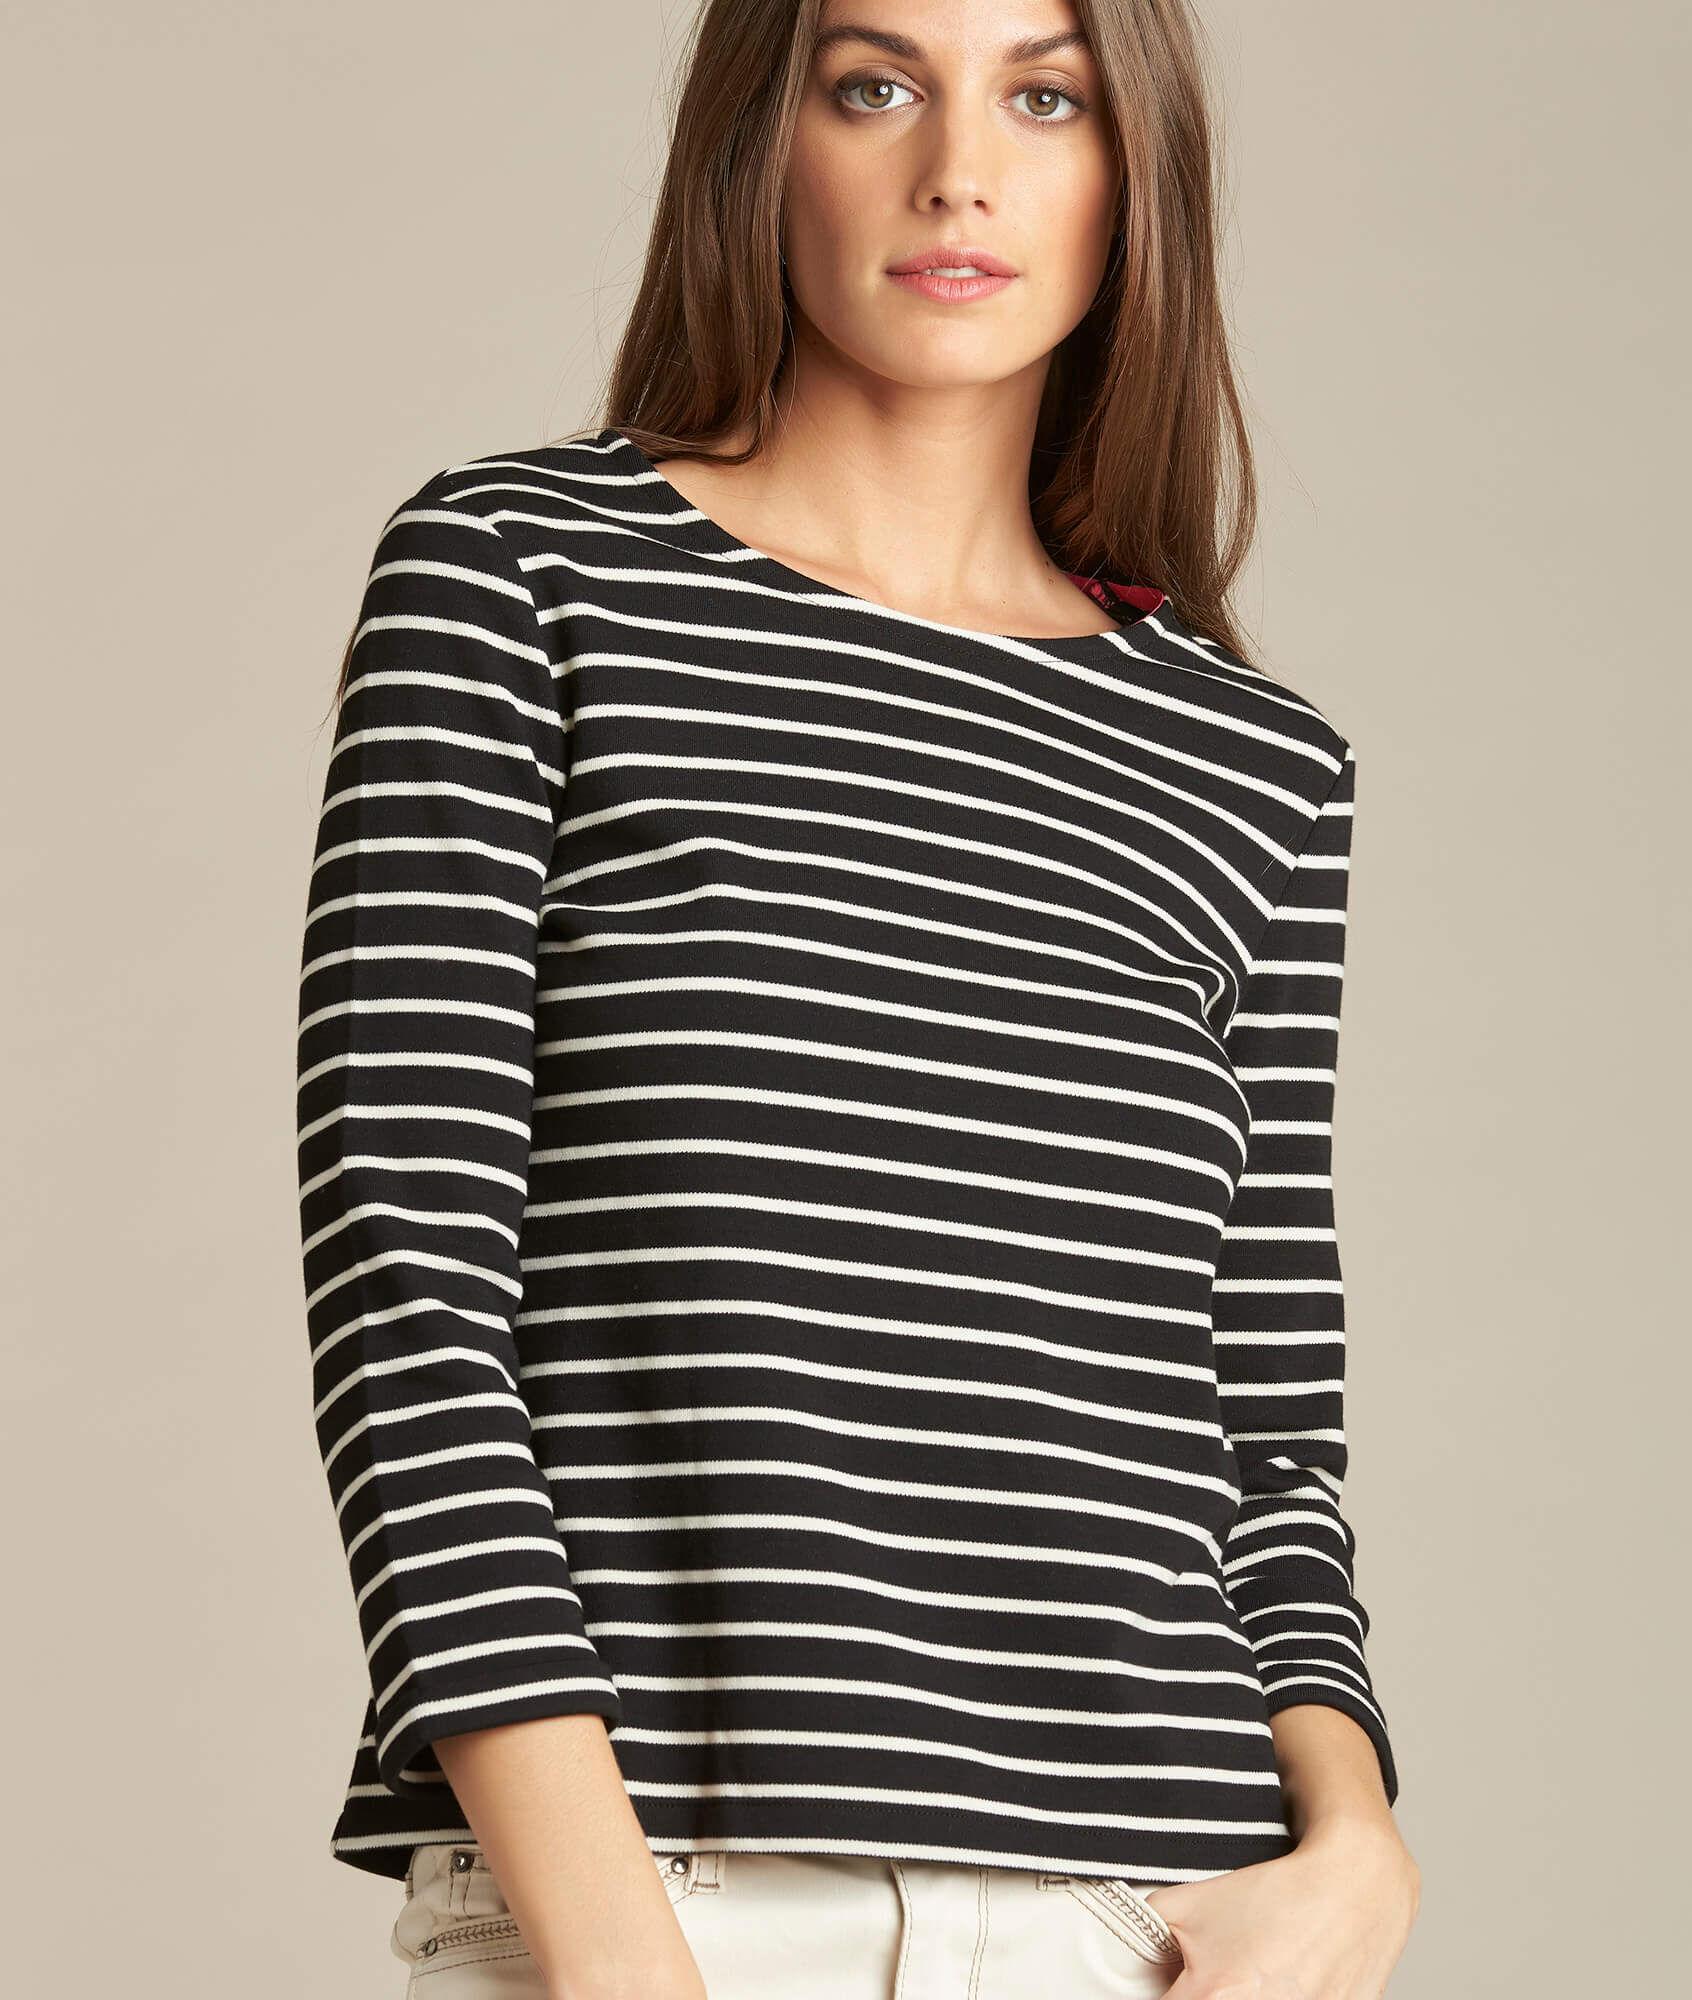 Tee-shirt noir rayé manches 3/4 Escadre (1) - 1-